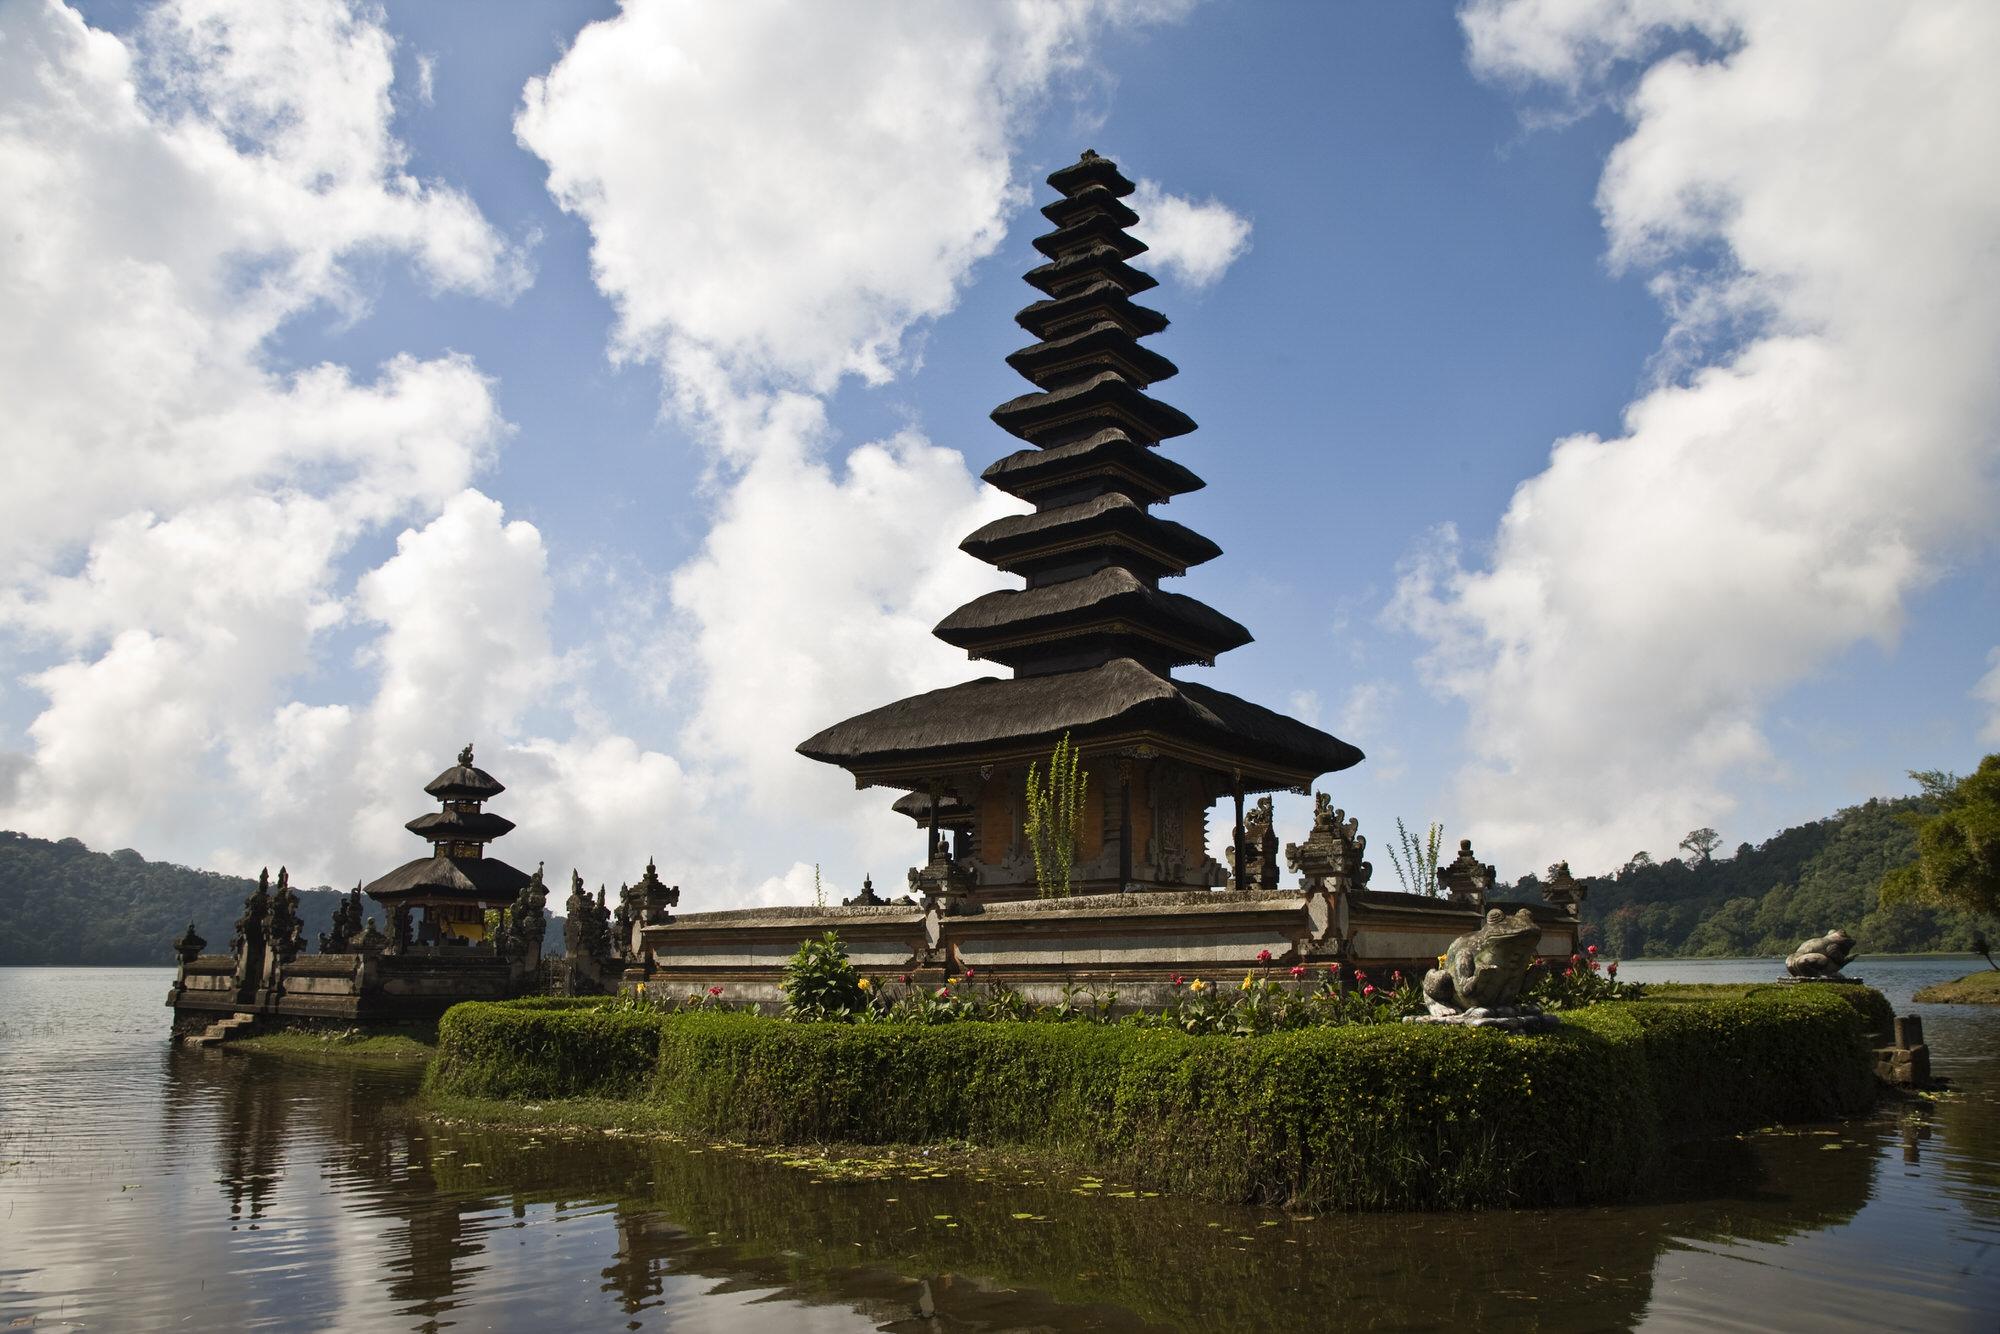 Der Pura Meru in Cakranegara, Lombok